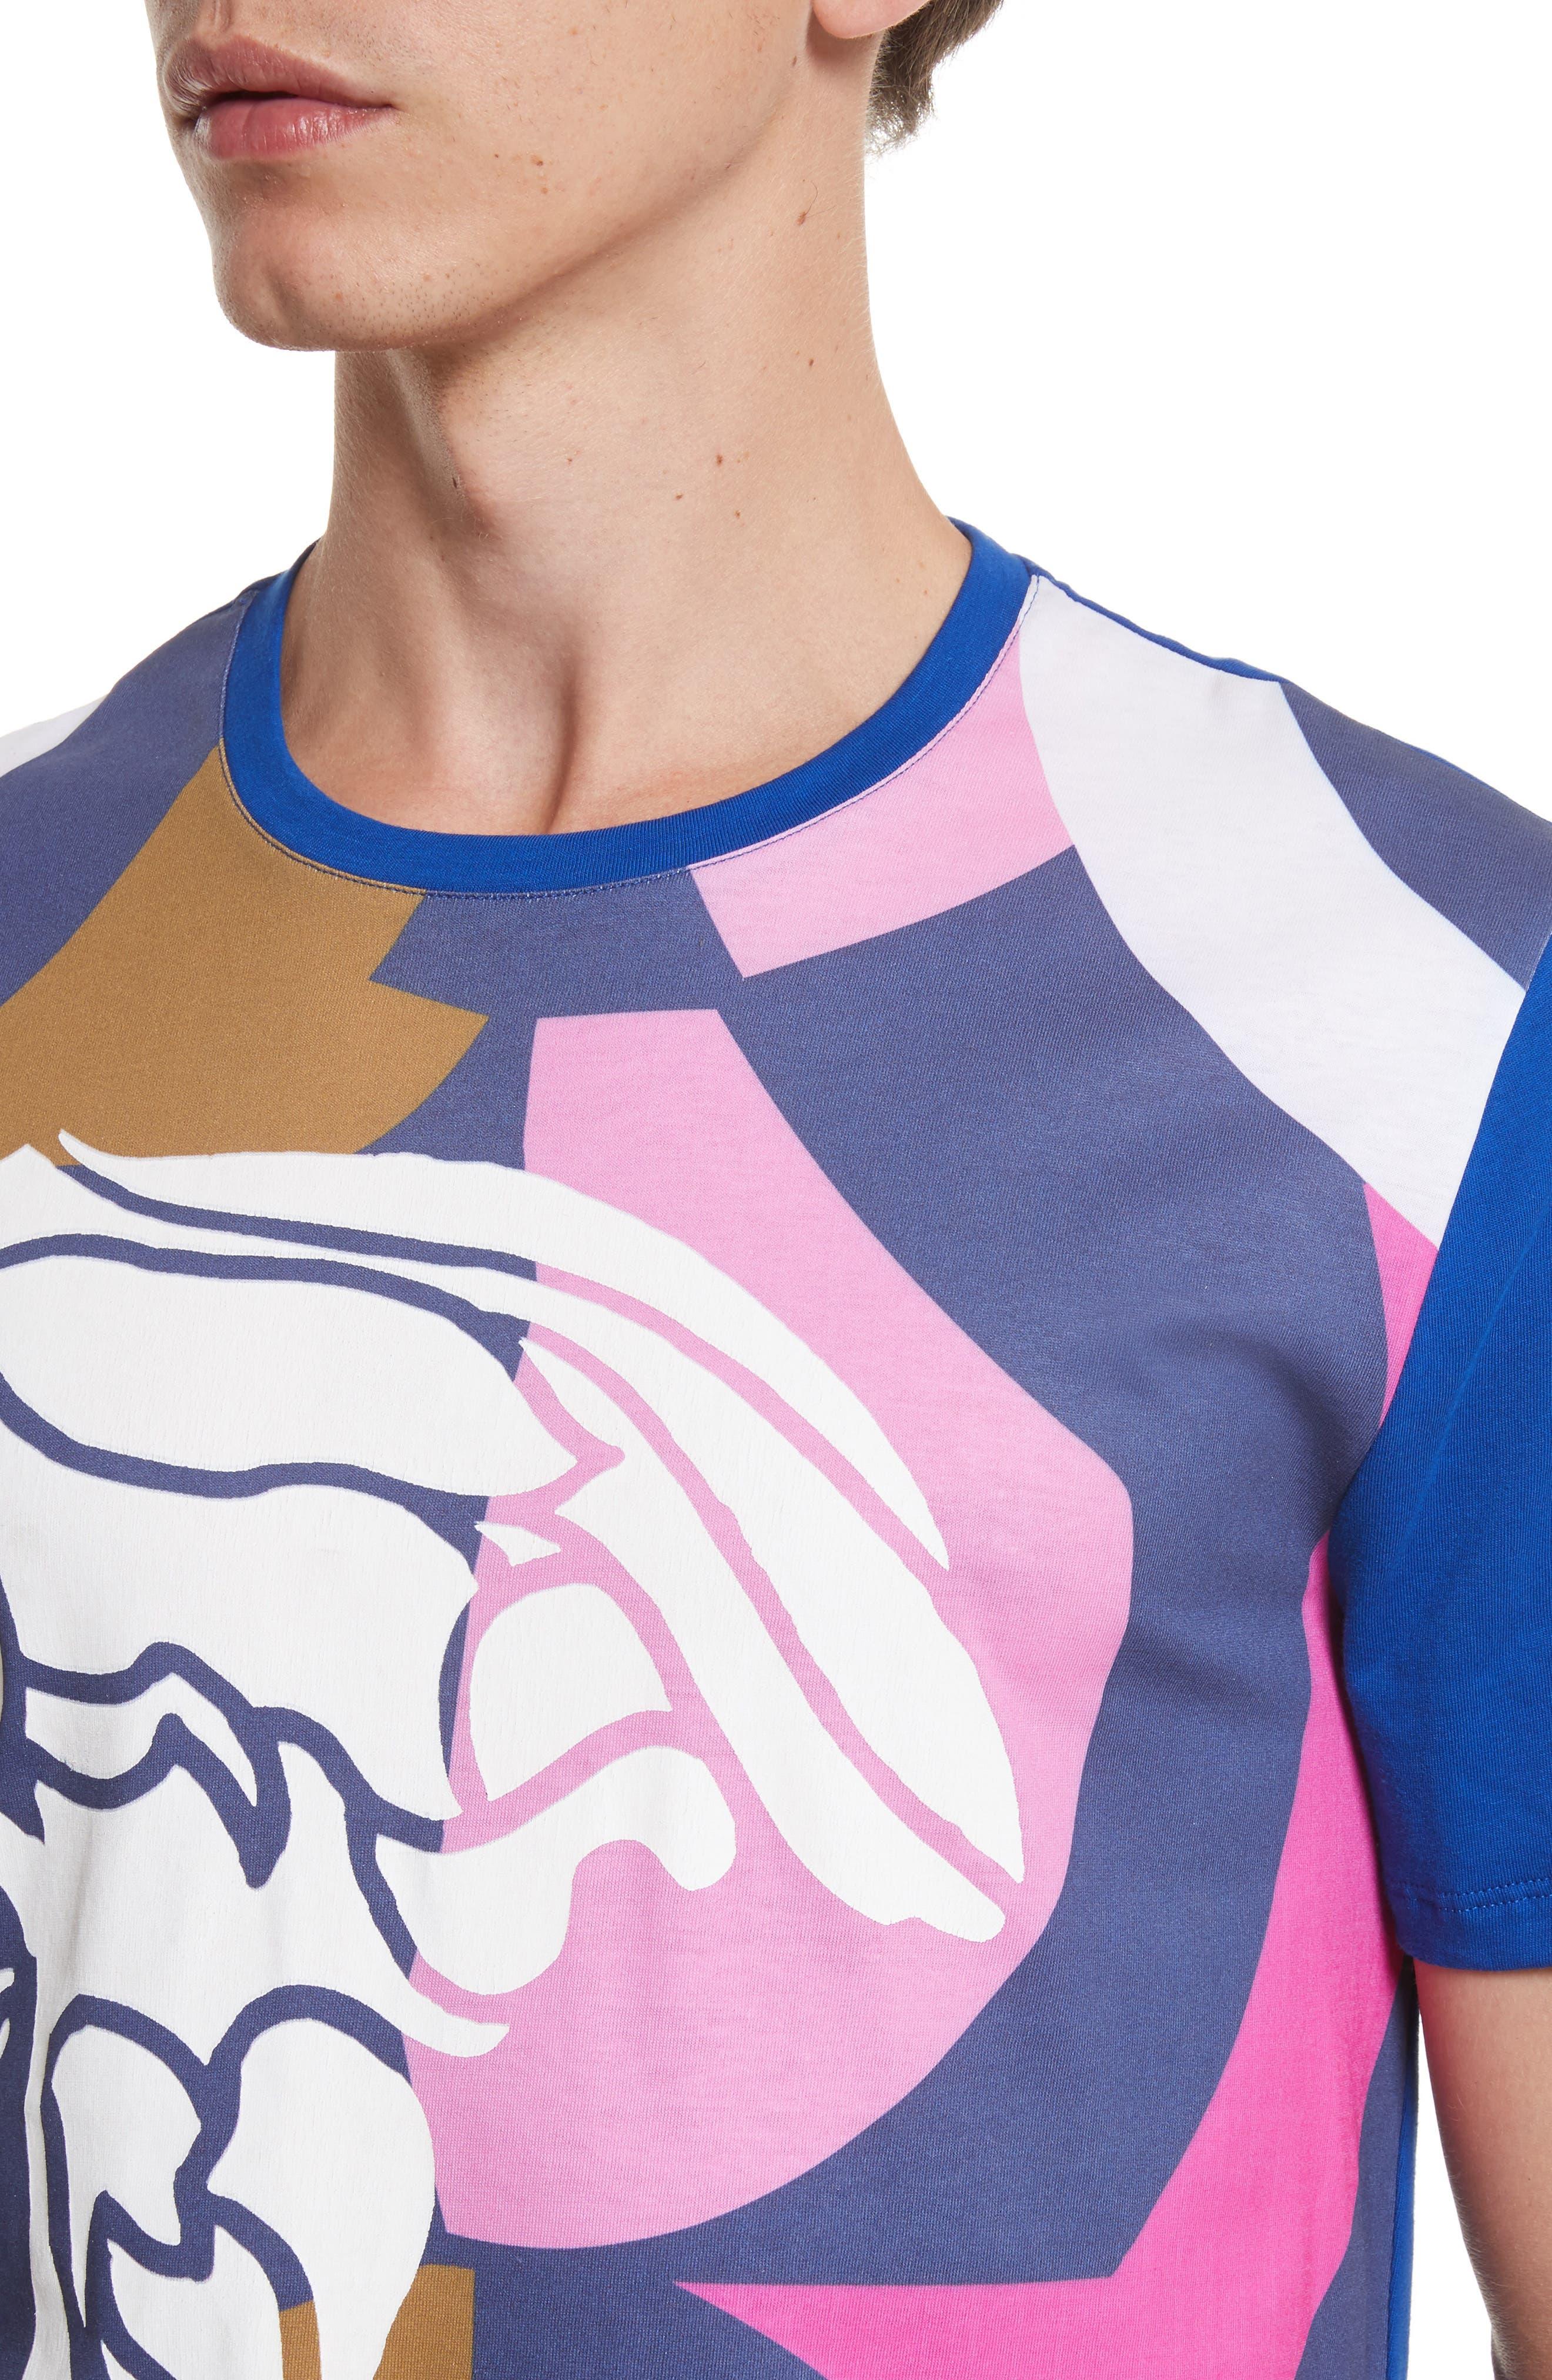 Abstract Medusa Print T-Shirt,                             Alternate thumbnail 4, color,                             Royal Blue